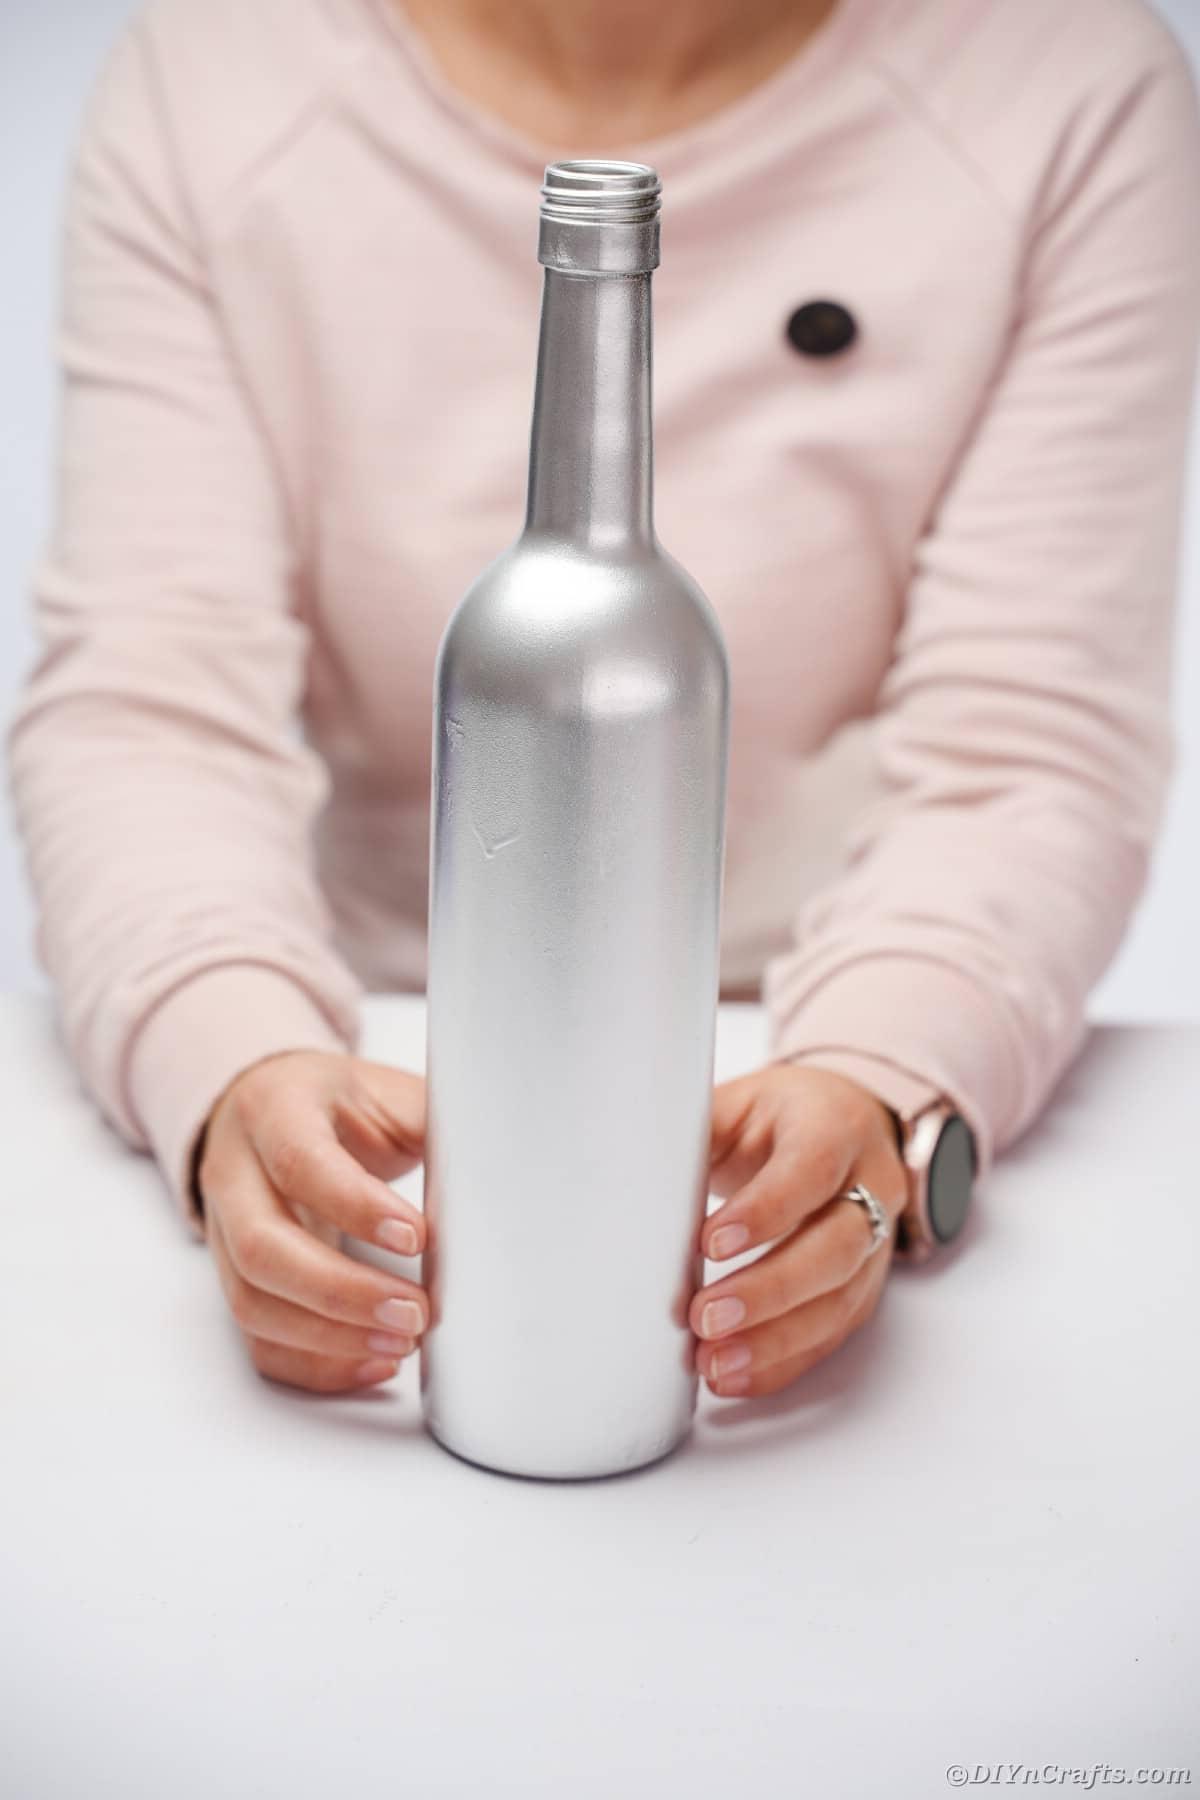 Spraying wine bottle silver